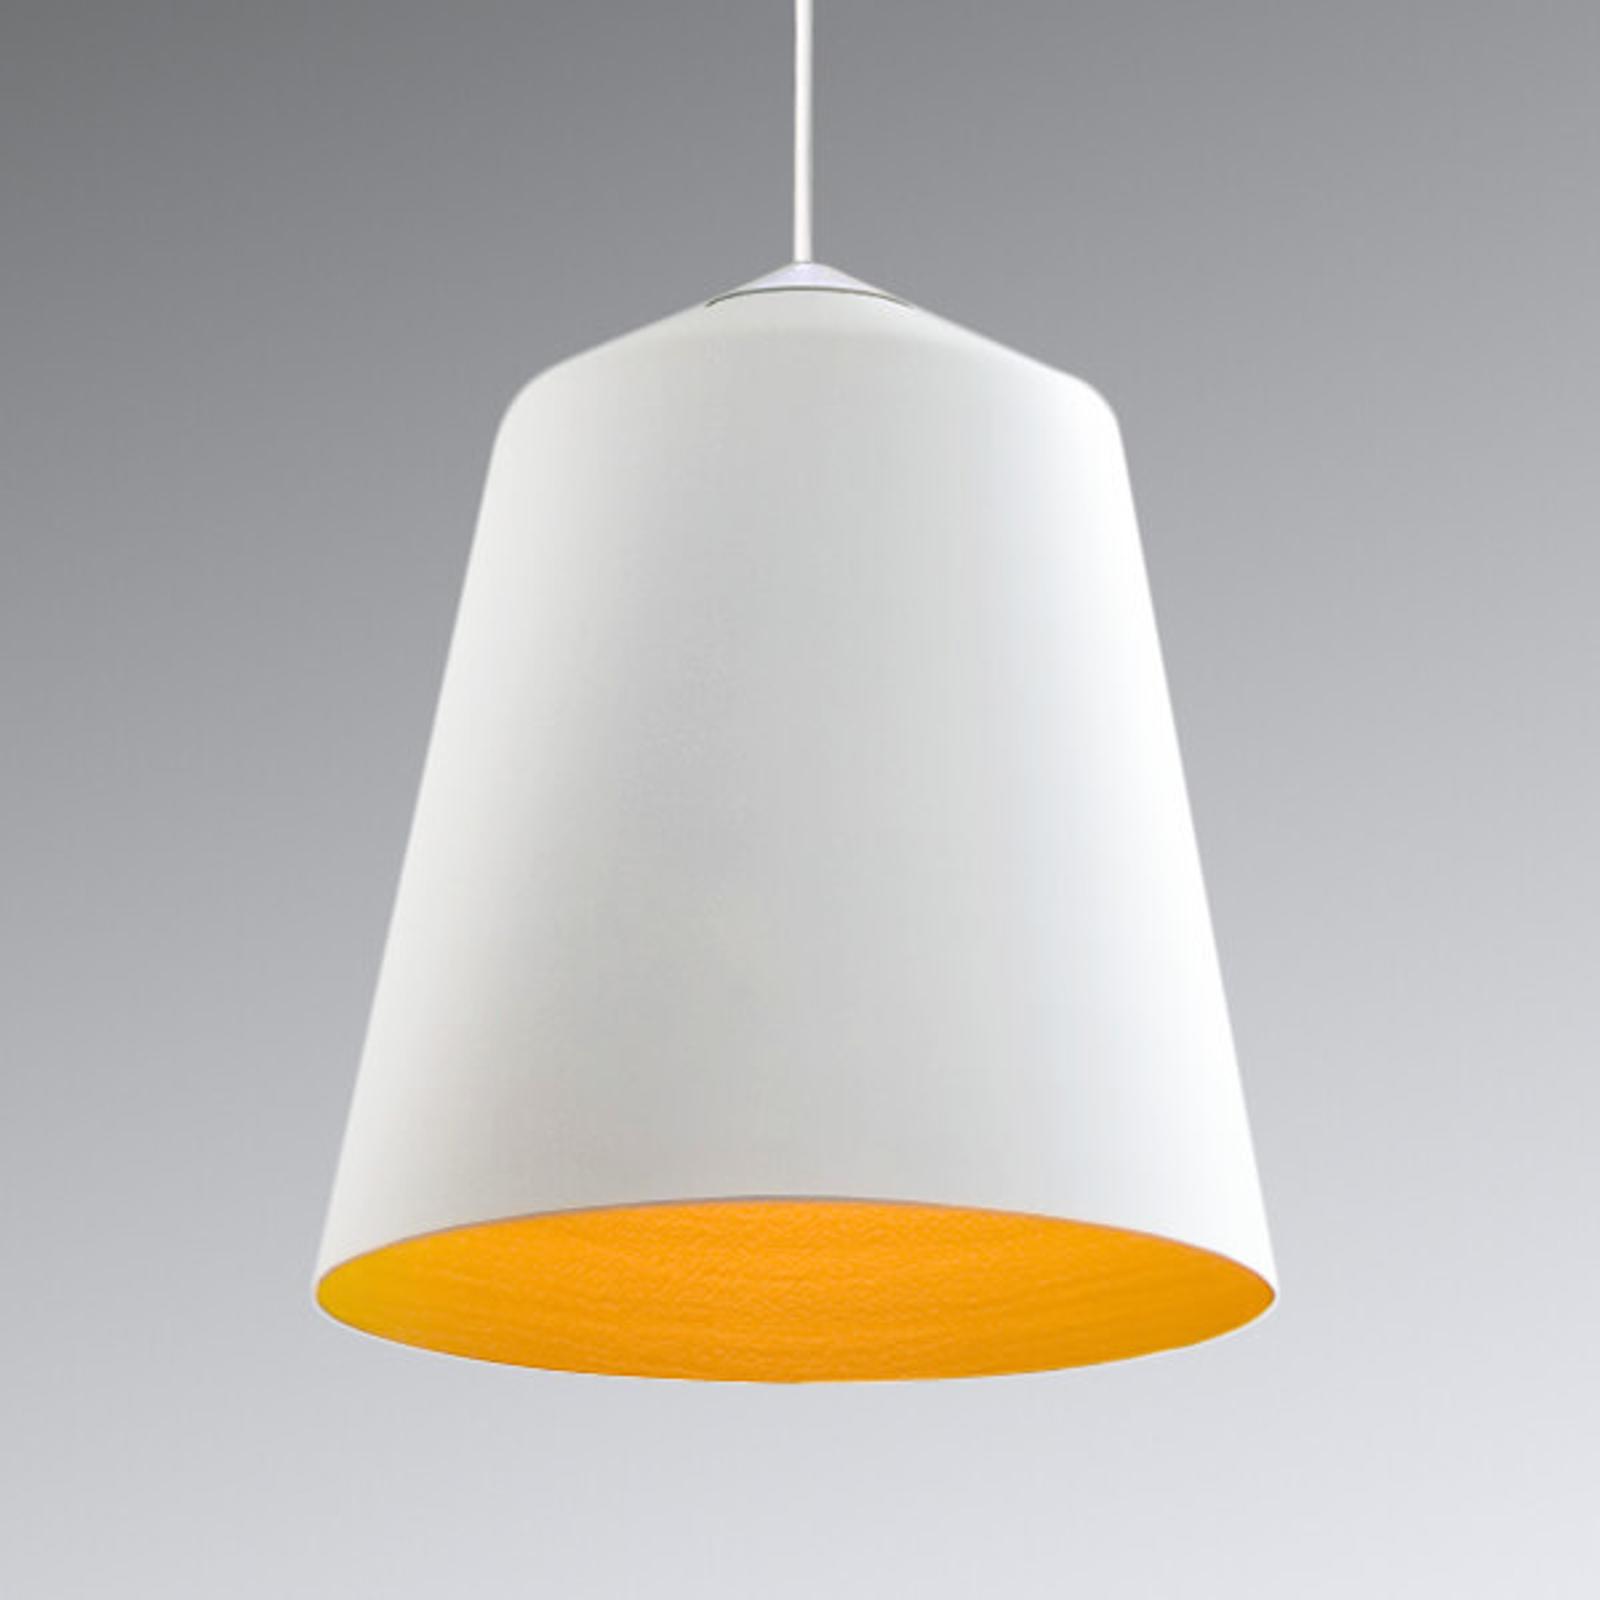 Innermost Circus - hængelampe, hvid-gylden, 36 cm